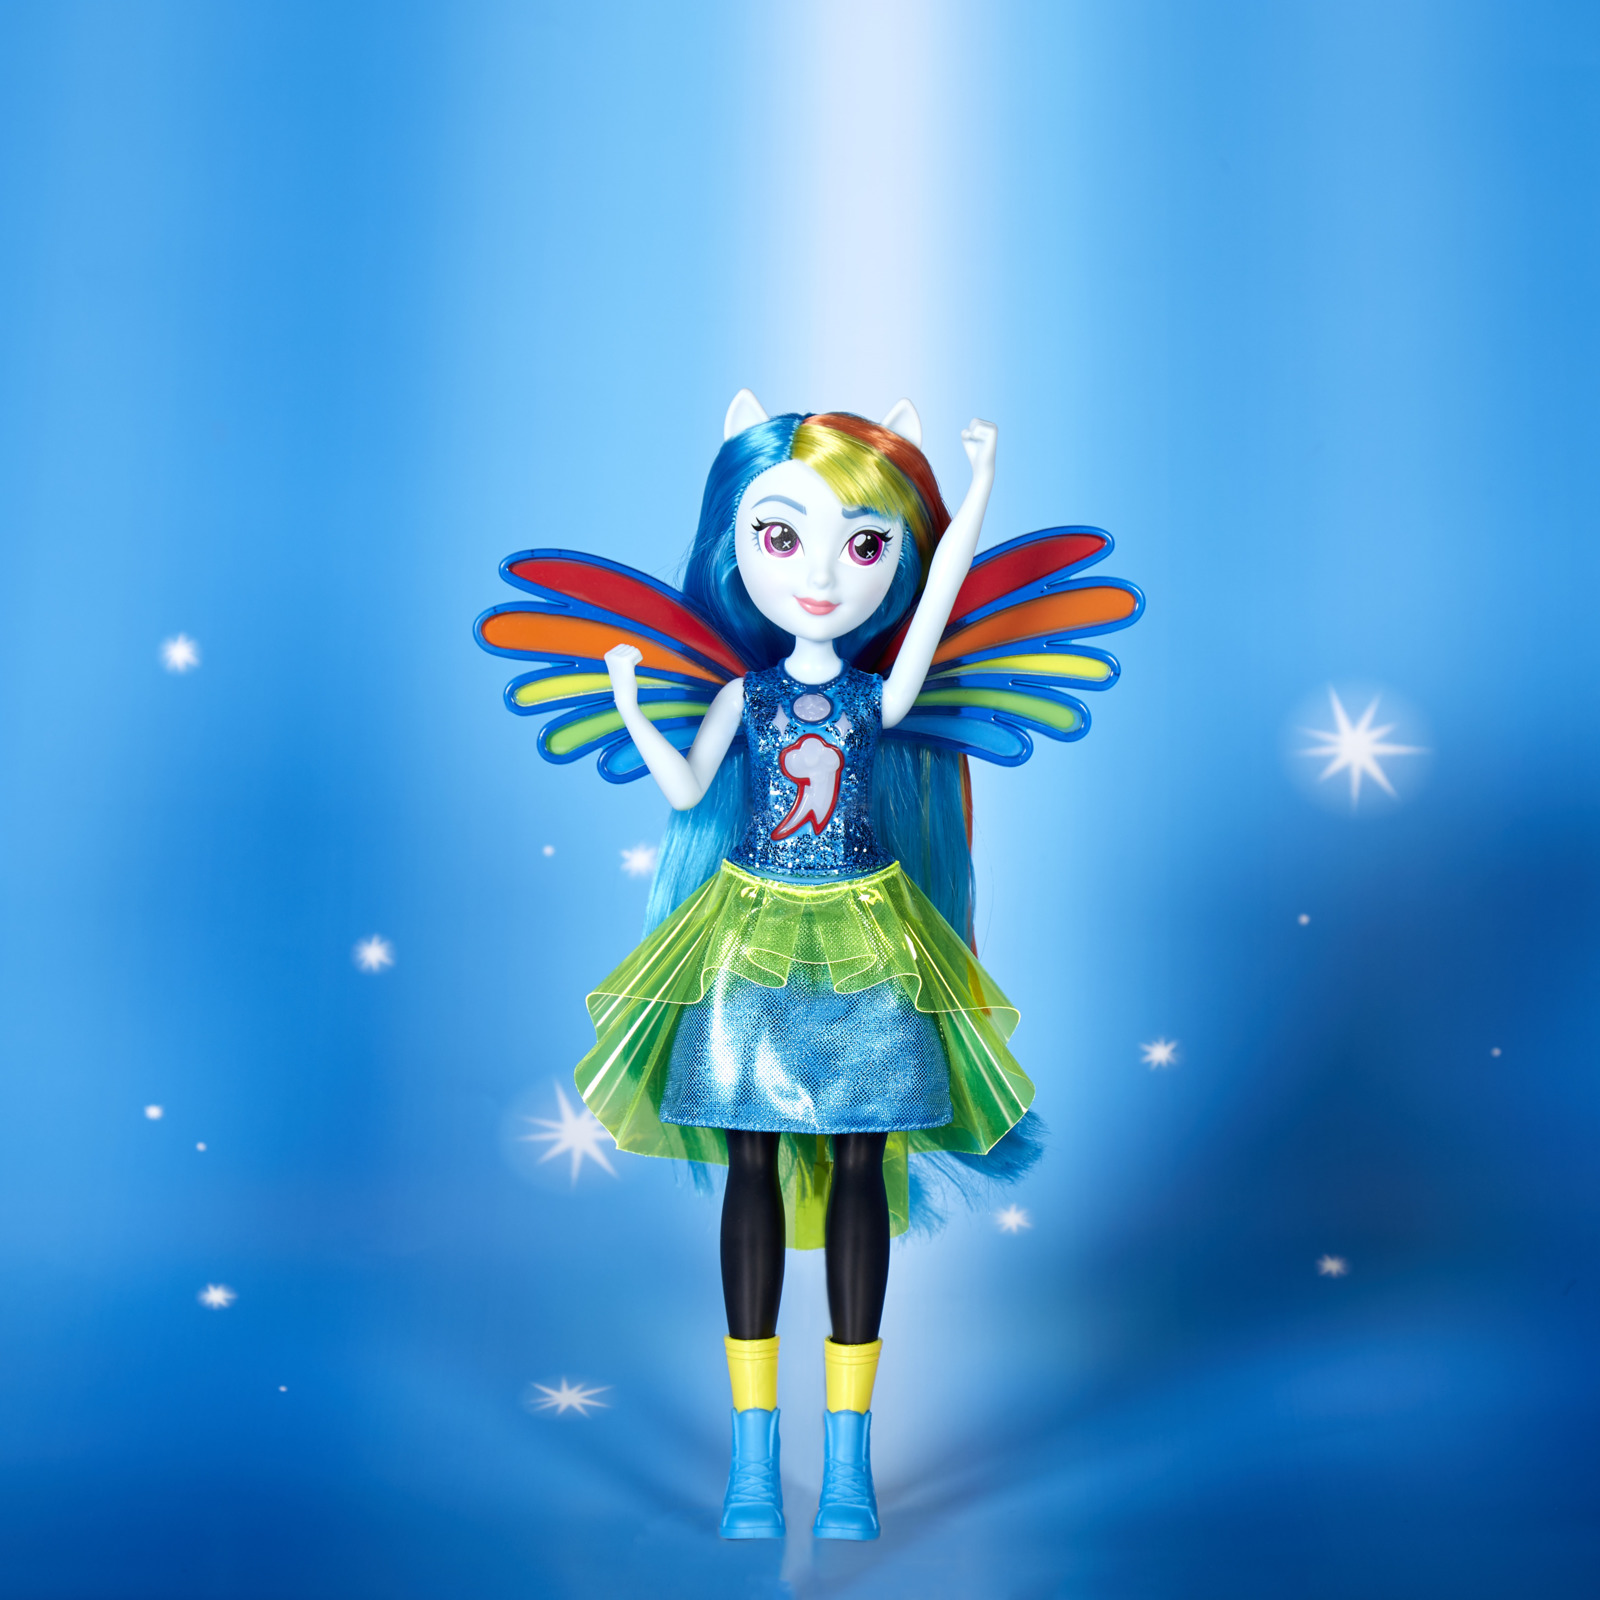 Кукла радуга дэш картинки